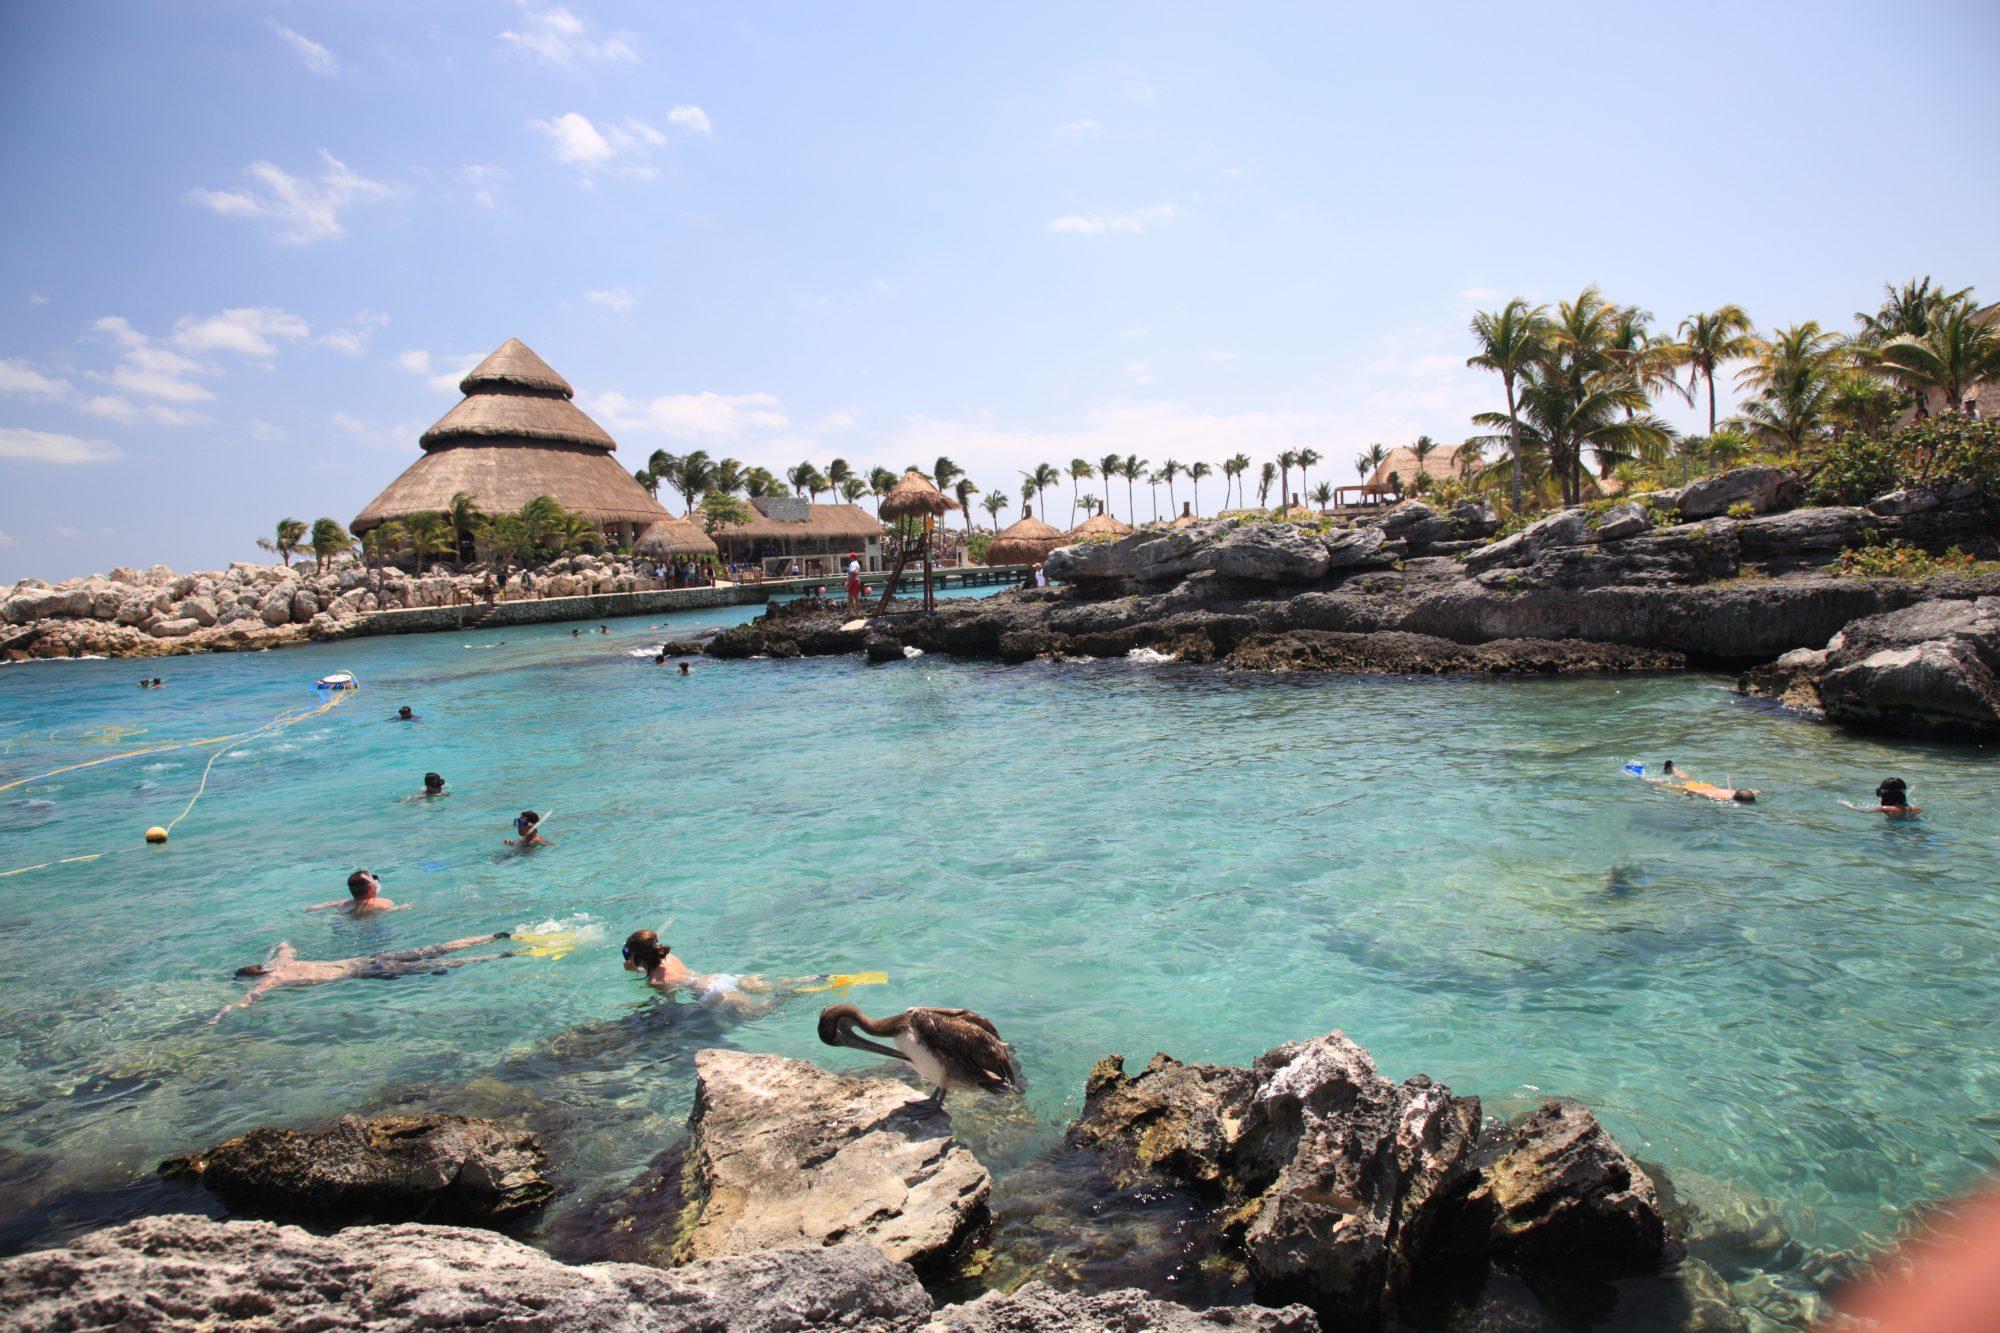 Parque acuático Xcaret, Mexico